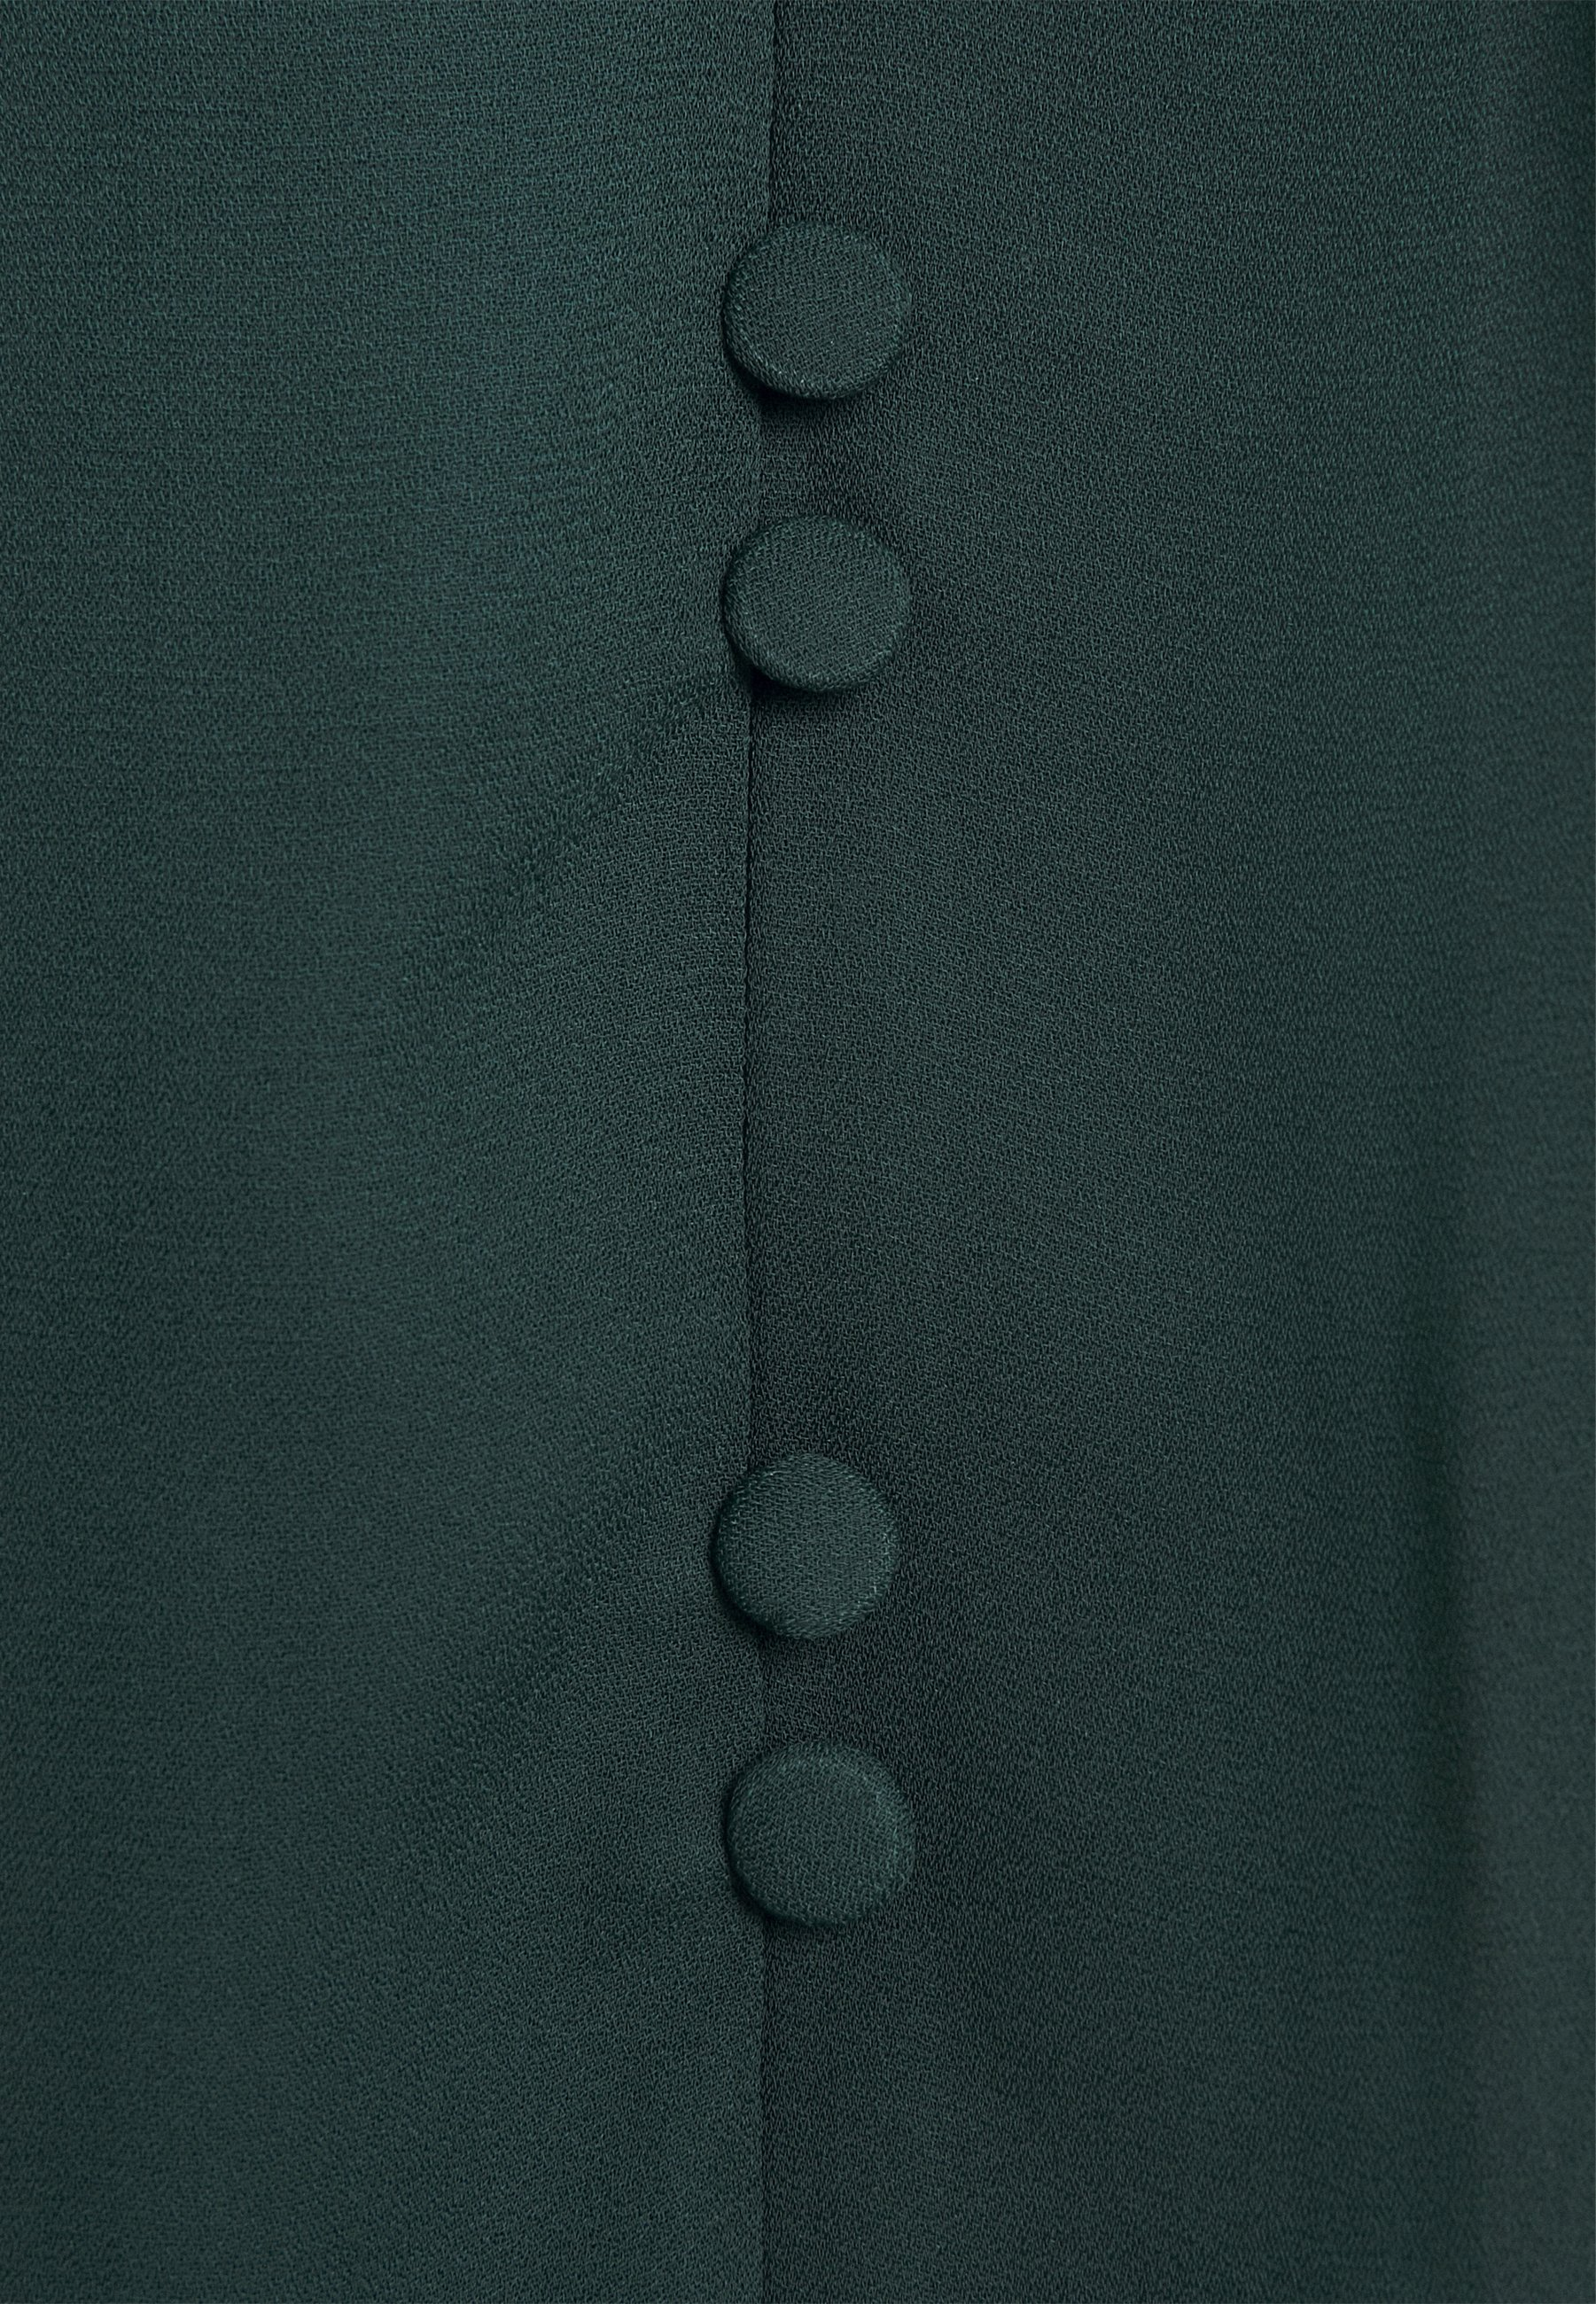 Naf Josephine - Bluser Dark Epicea/grønn